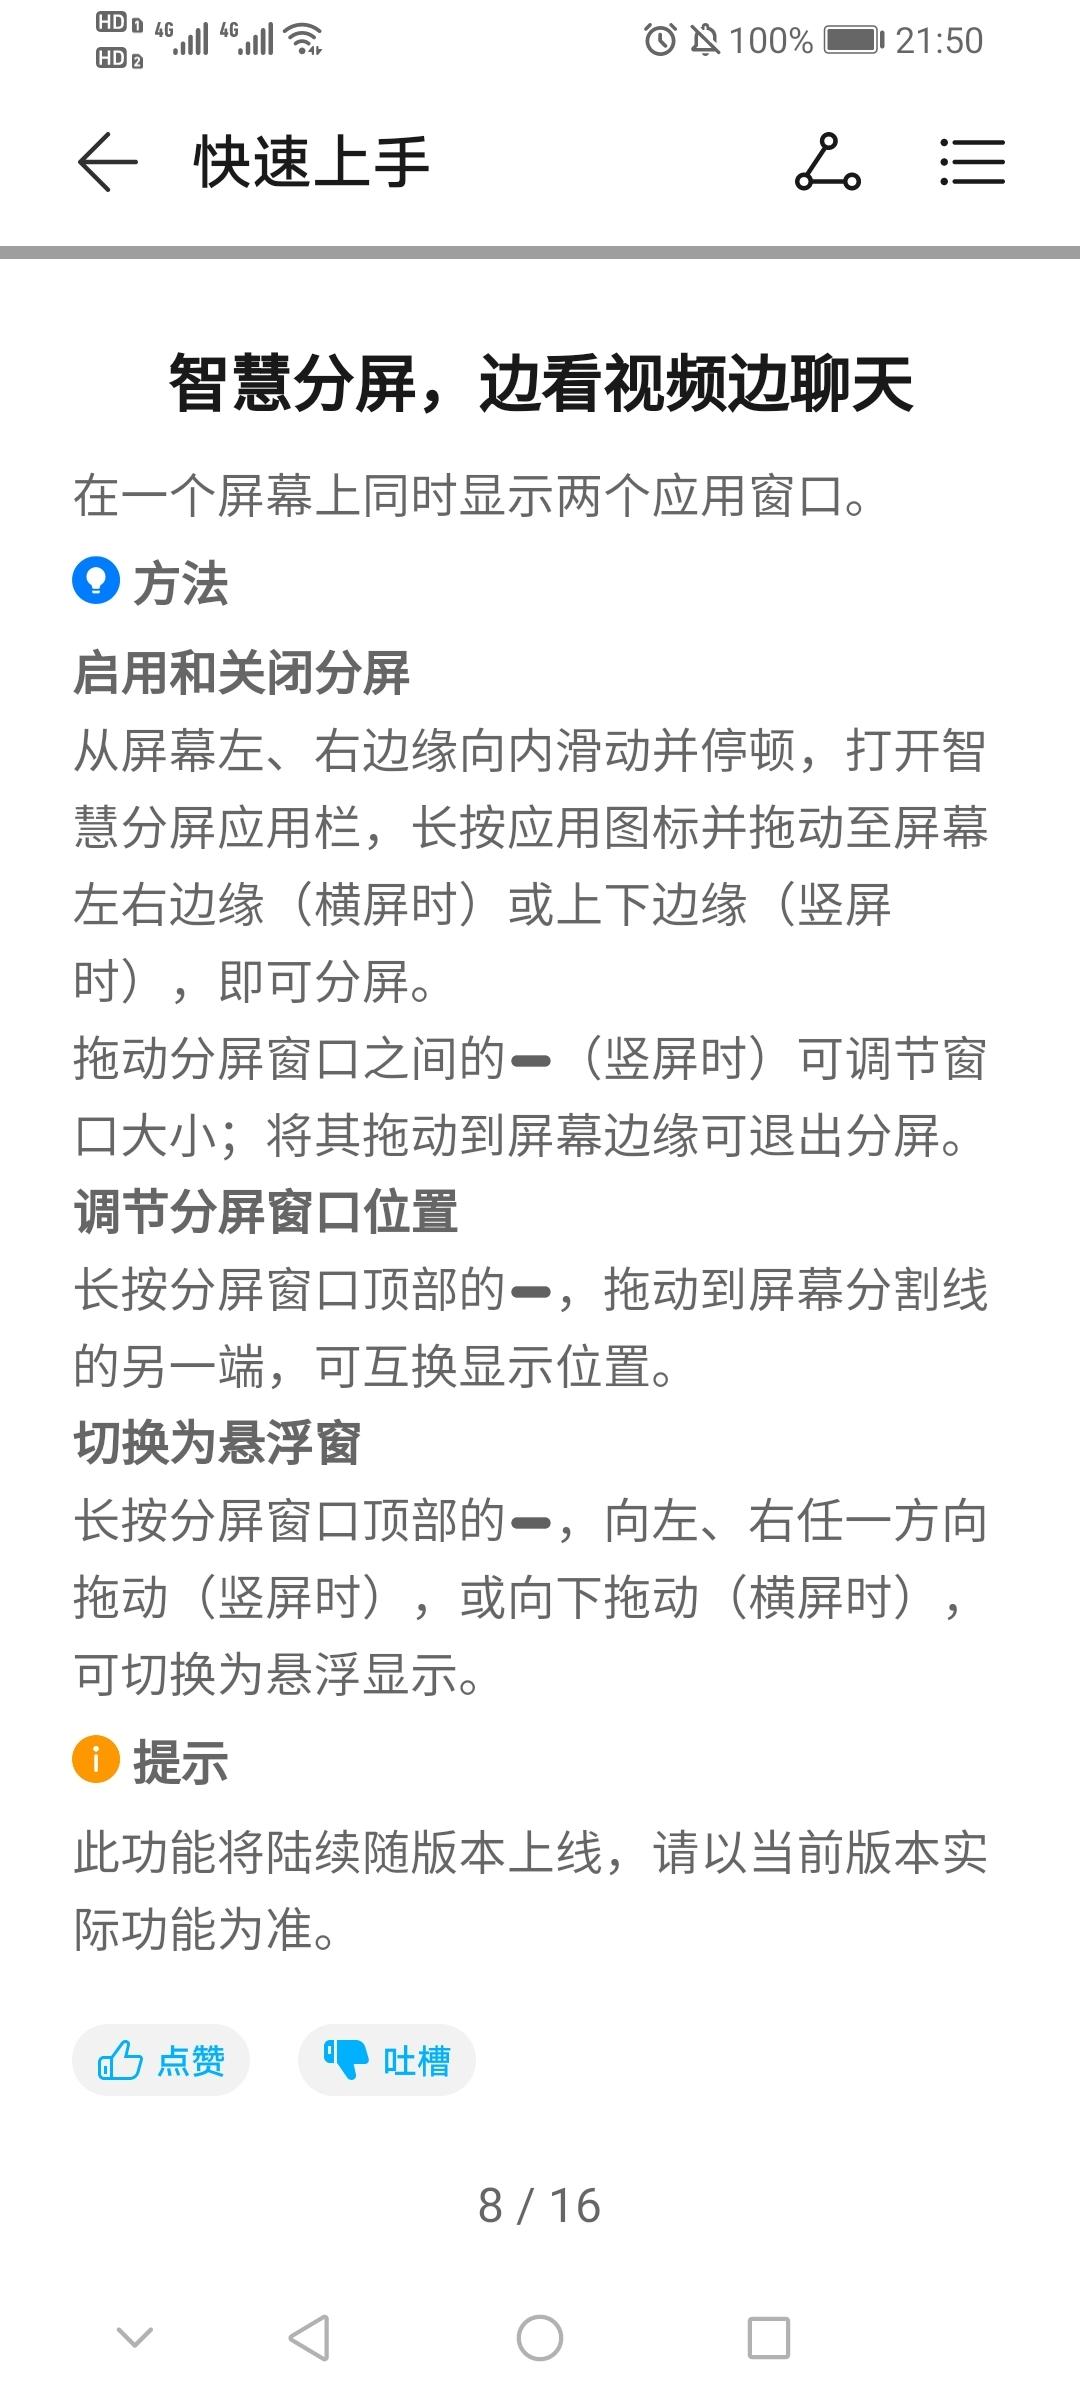 Screenshot_20210923_215010_com.huawei.android.tips.jpg